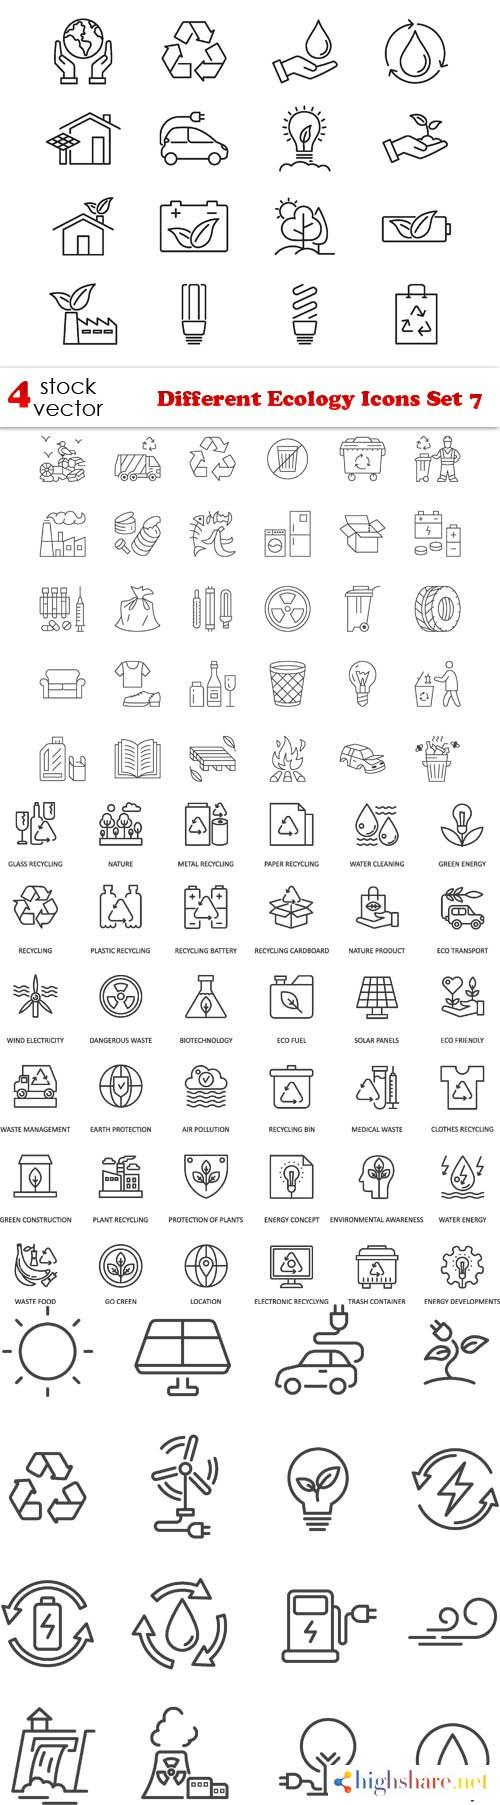 vectors different ecology icons set 7 5f3fc93619e33 - Vectors - Different Ecology Icons Set 7